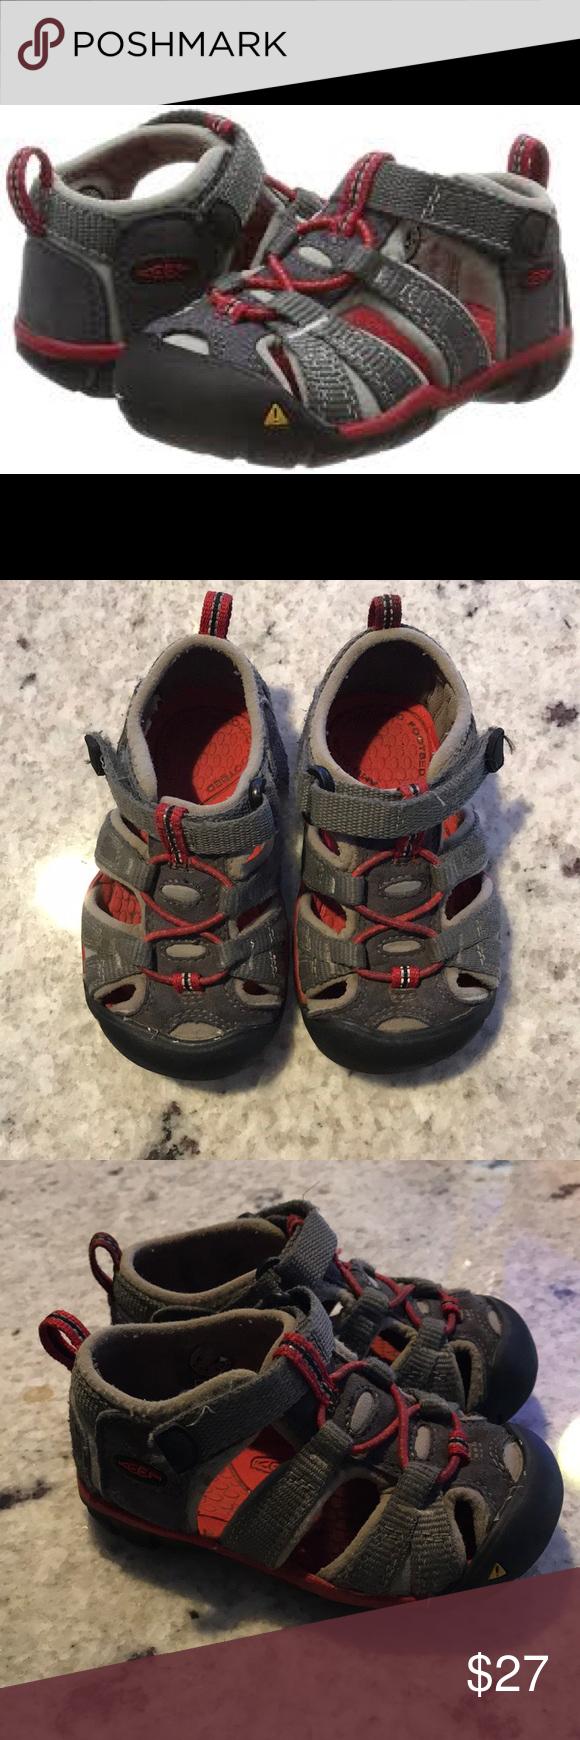 Keen Hybrid Shoes